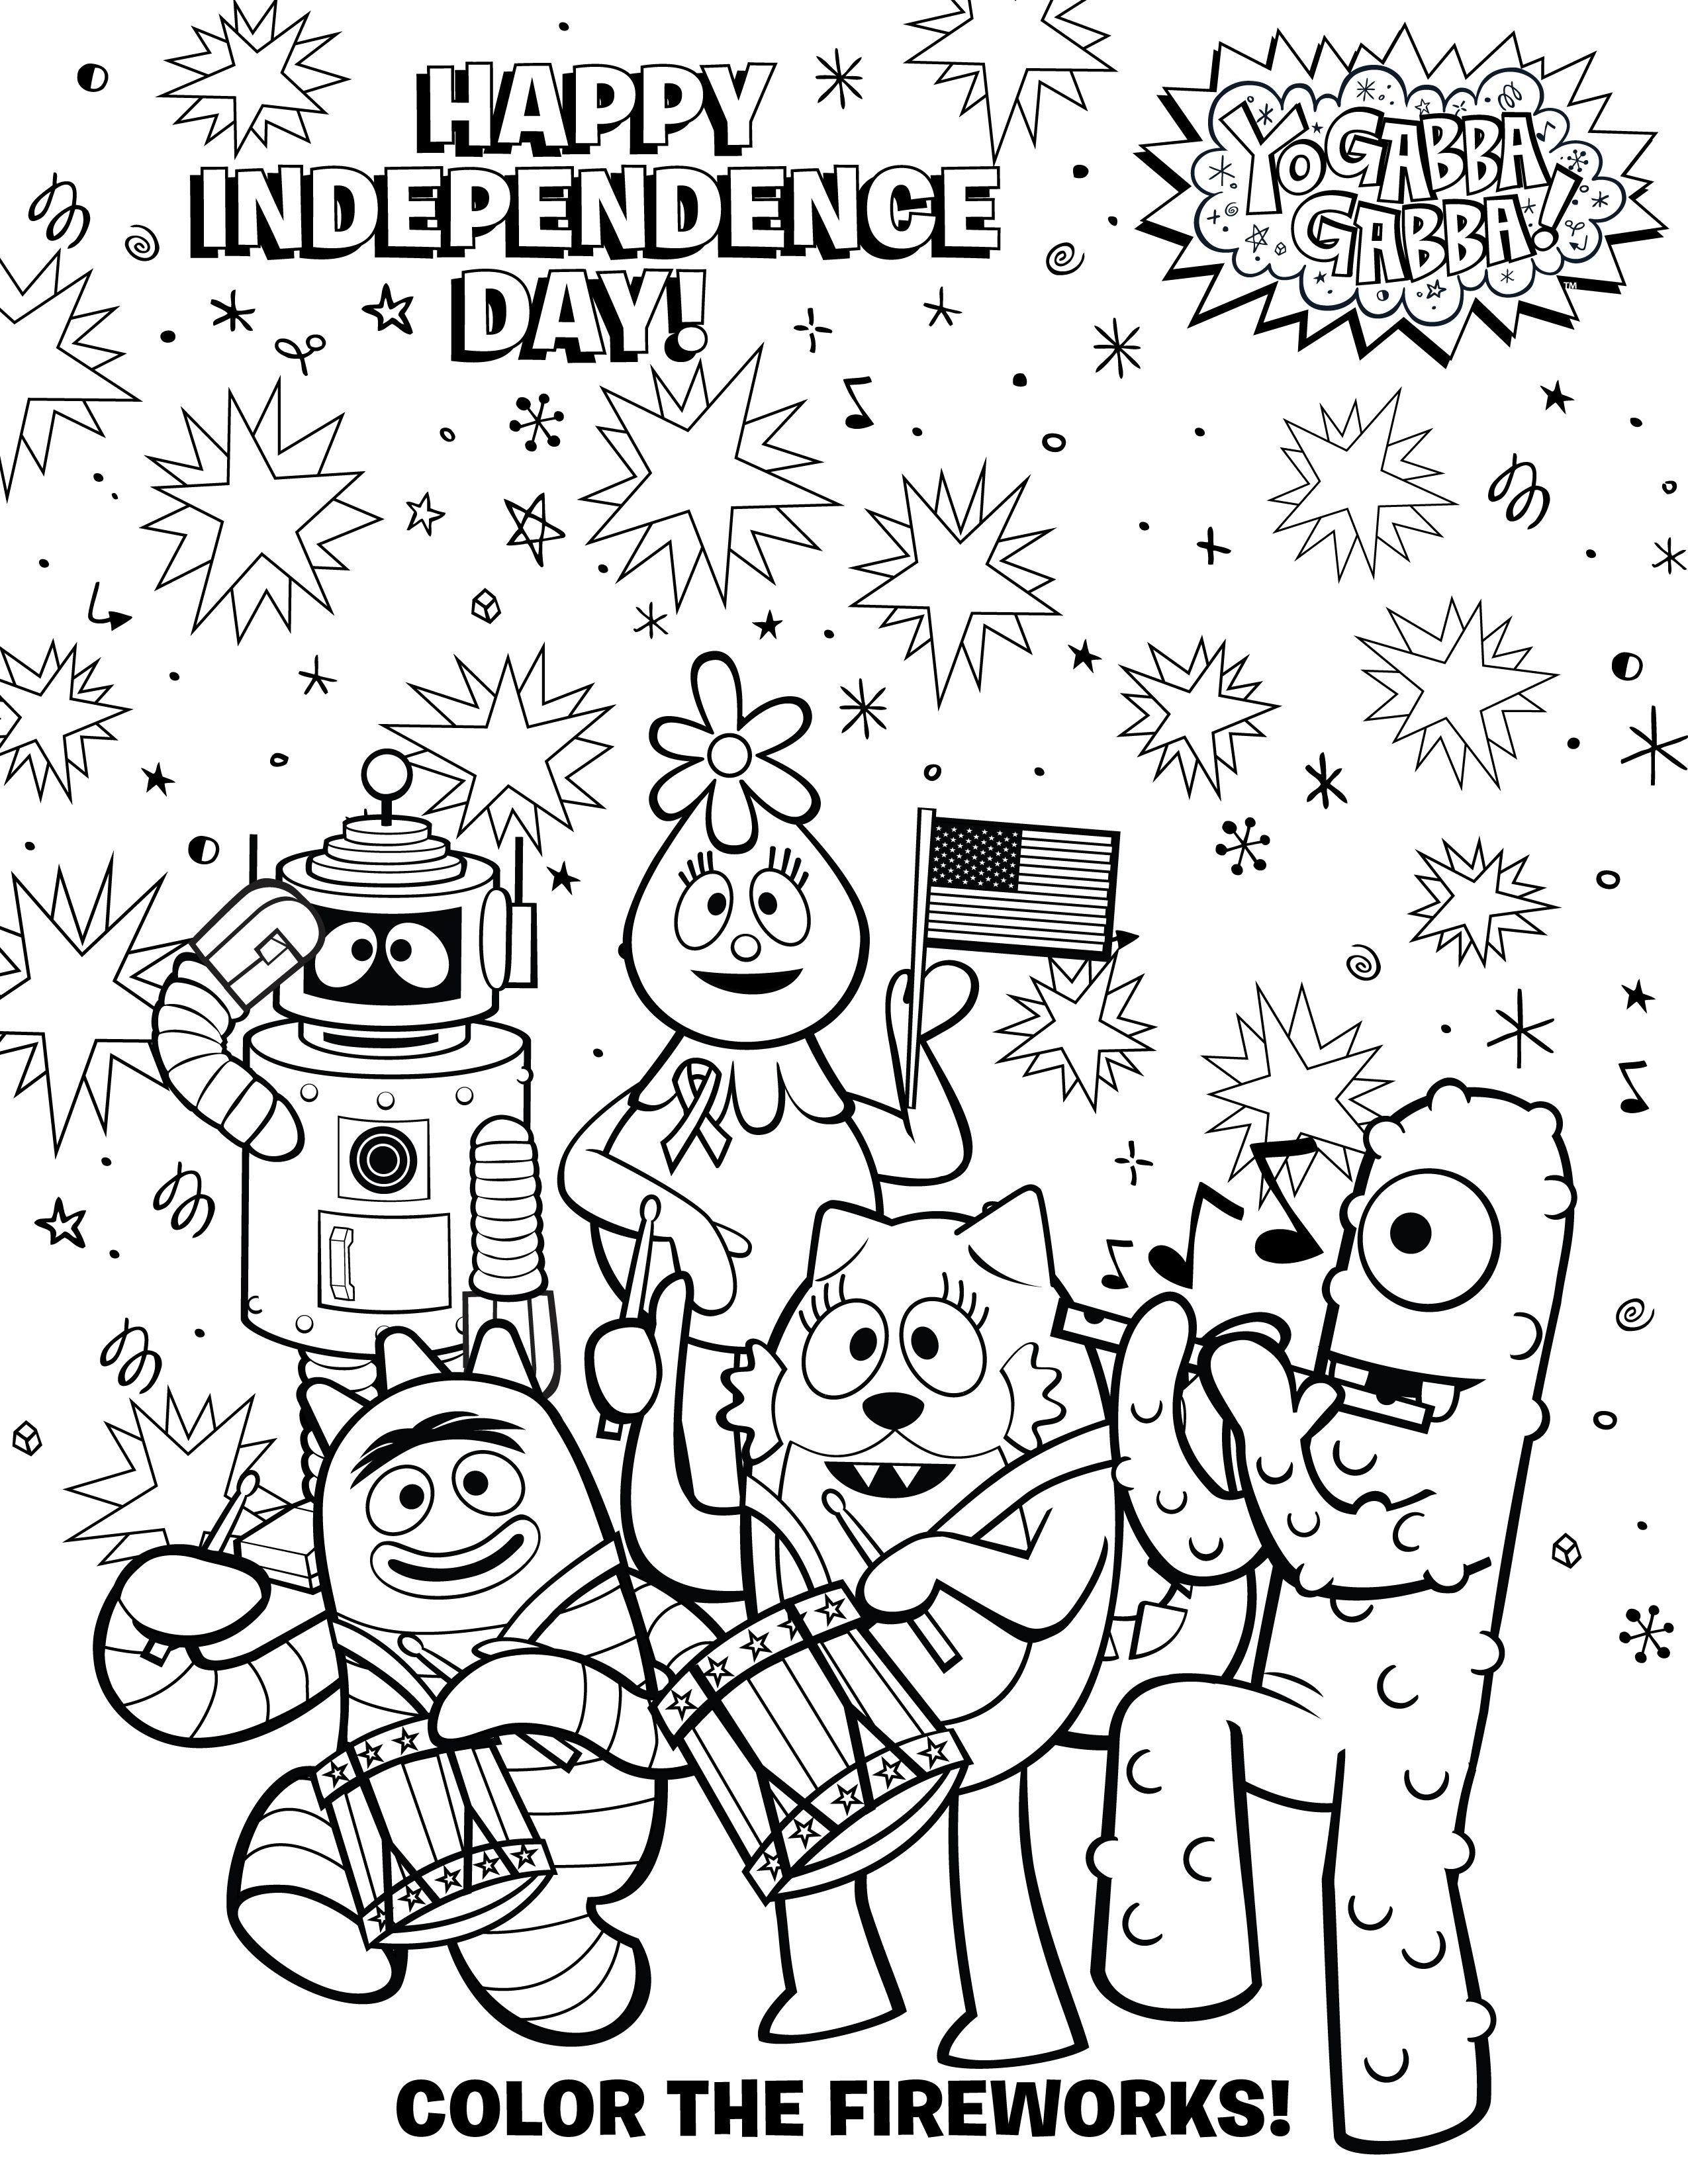 Enjoy this free YGG July4th coloring sheet! Dance